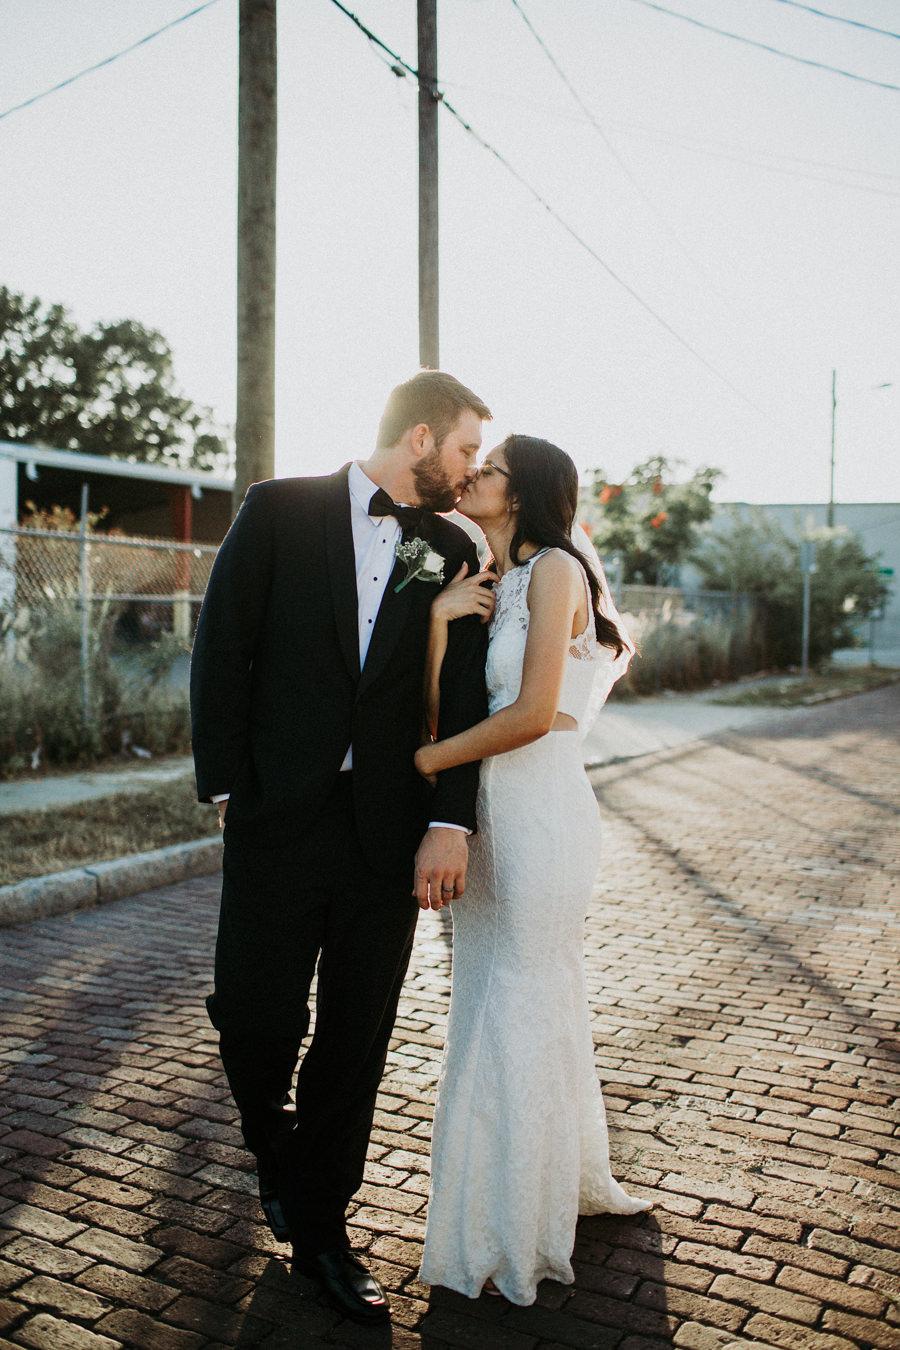 Tampa Heights Industrial Wedding at Cavu Emmy RJ-165.jpg